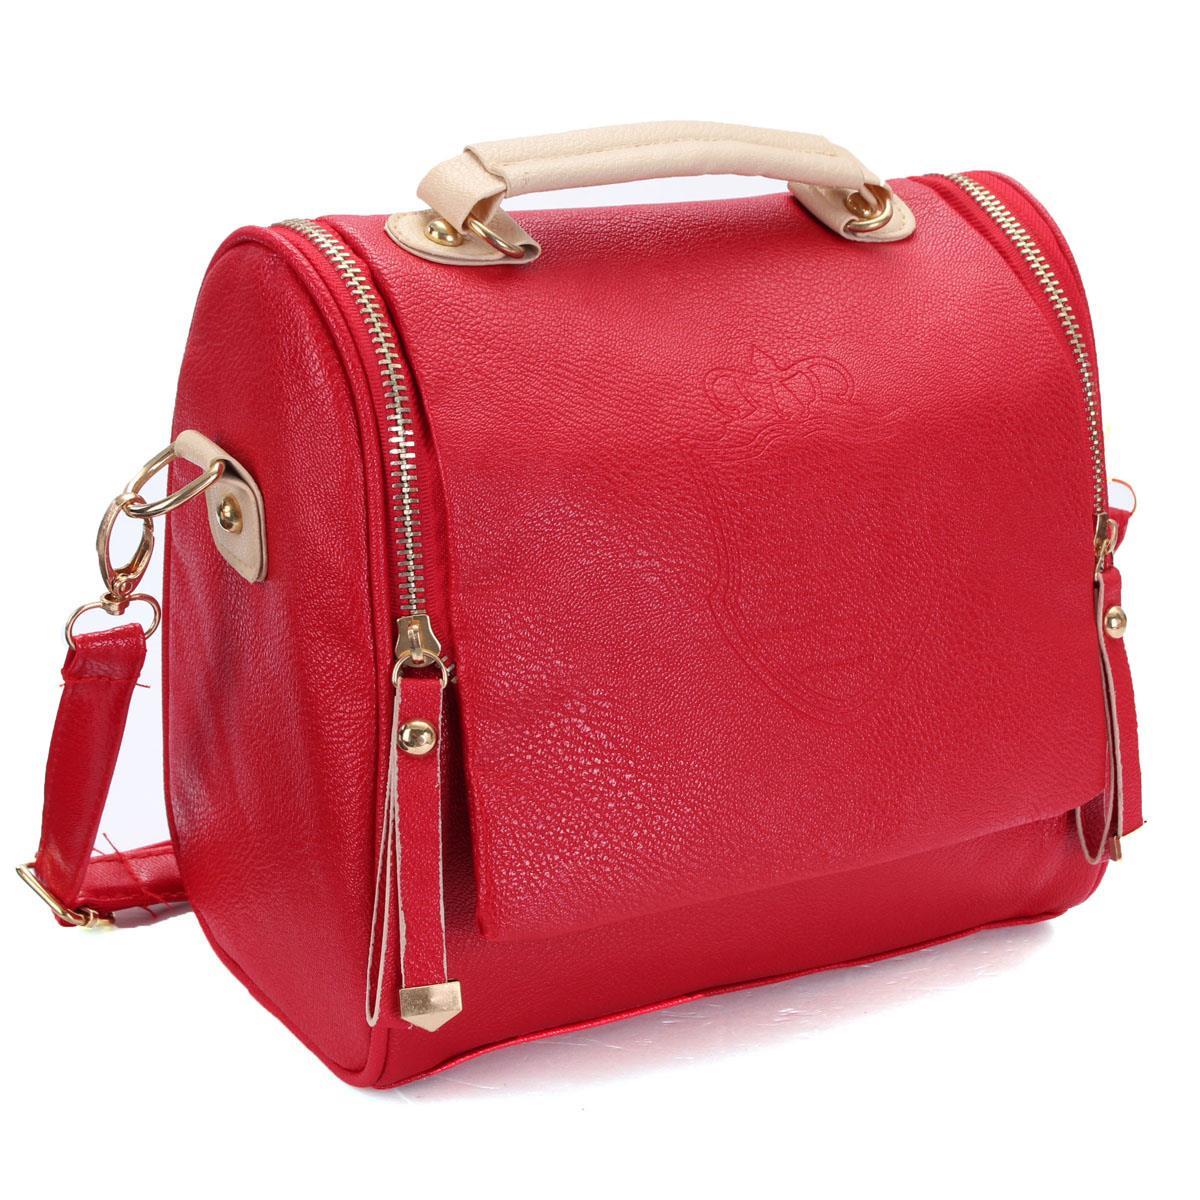 Hot Sale Women Handbgas Lady Embossed Crown PU Leather Retro Messenger Shoulder Bags Satchel Vintage Tote Bolsas Fashion Style(China (Mainland))